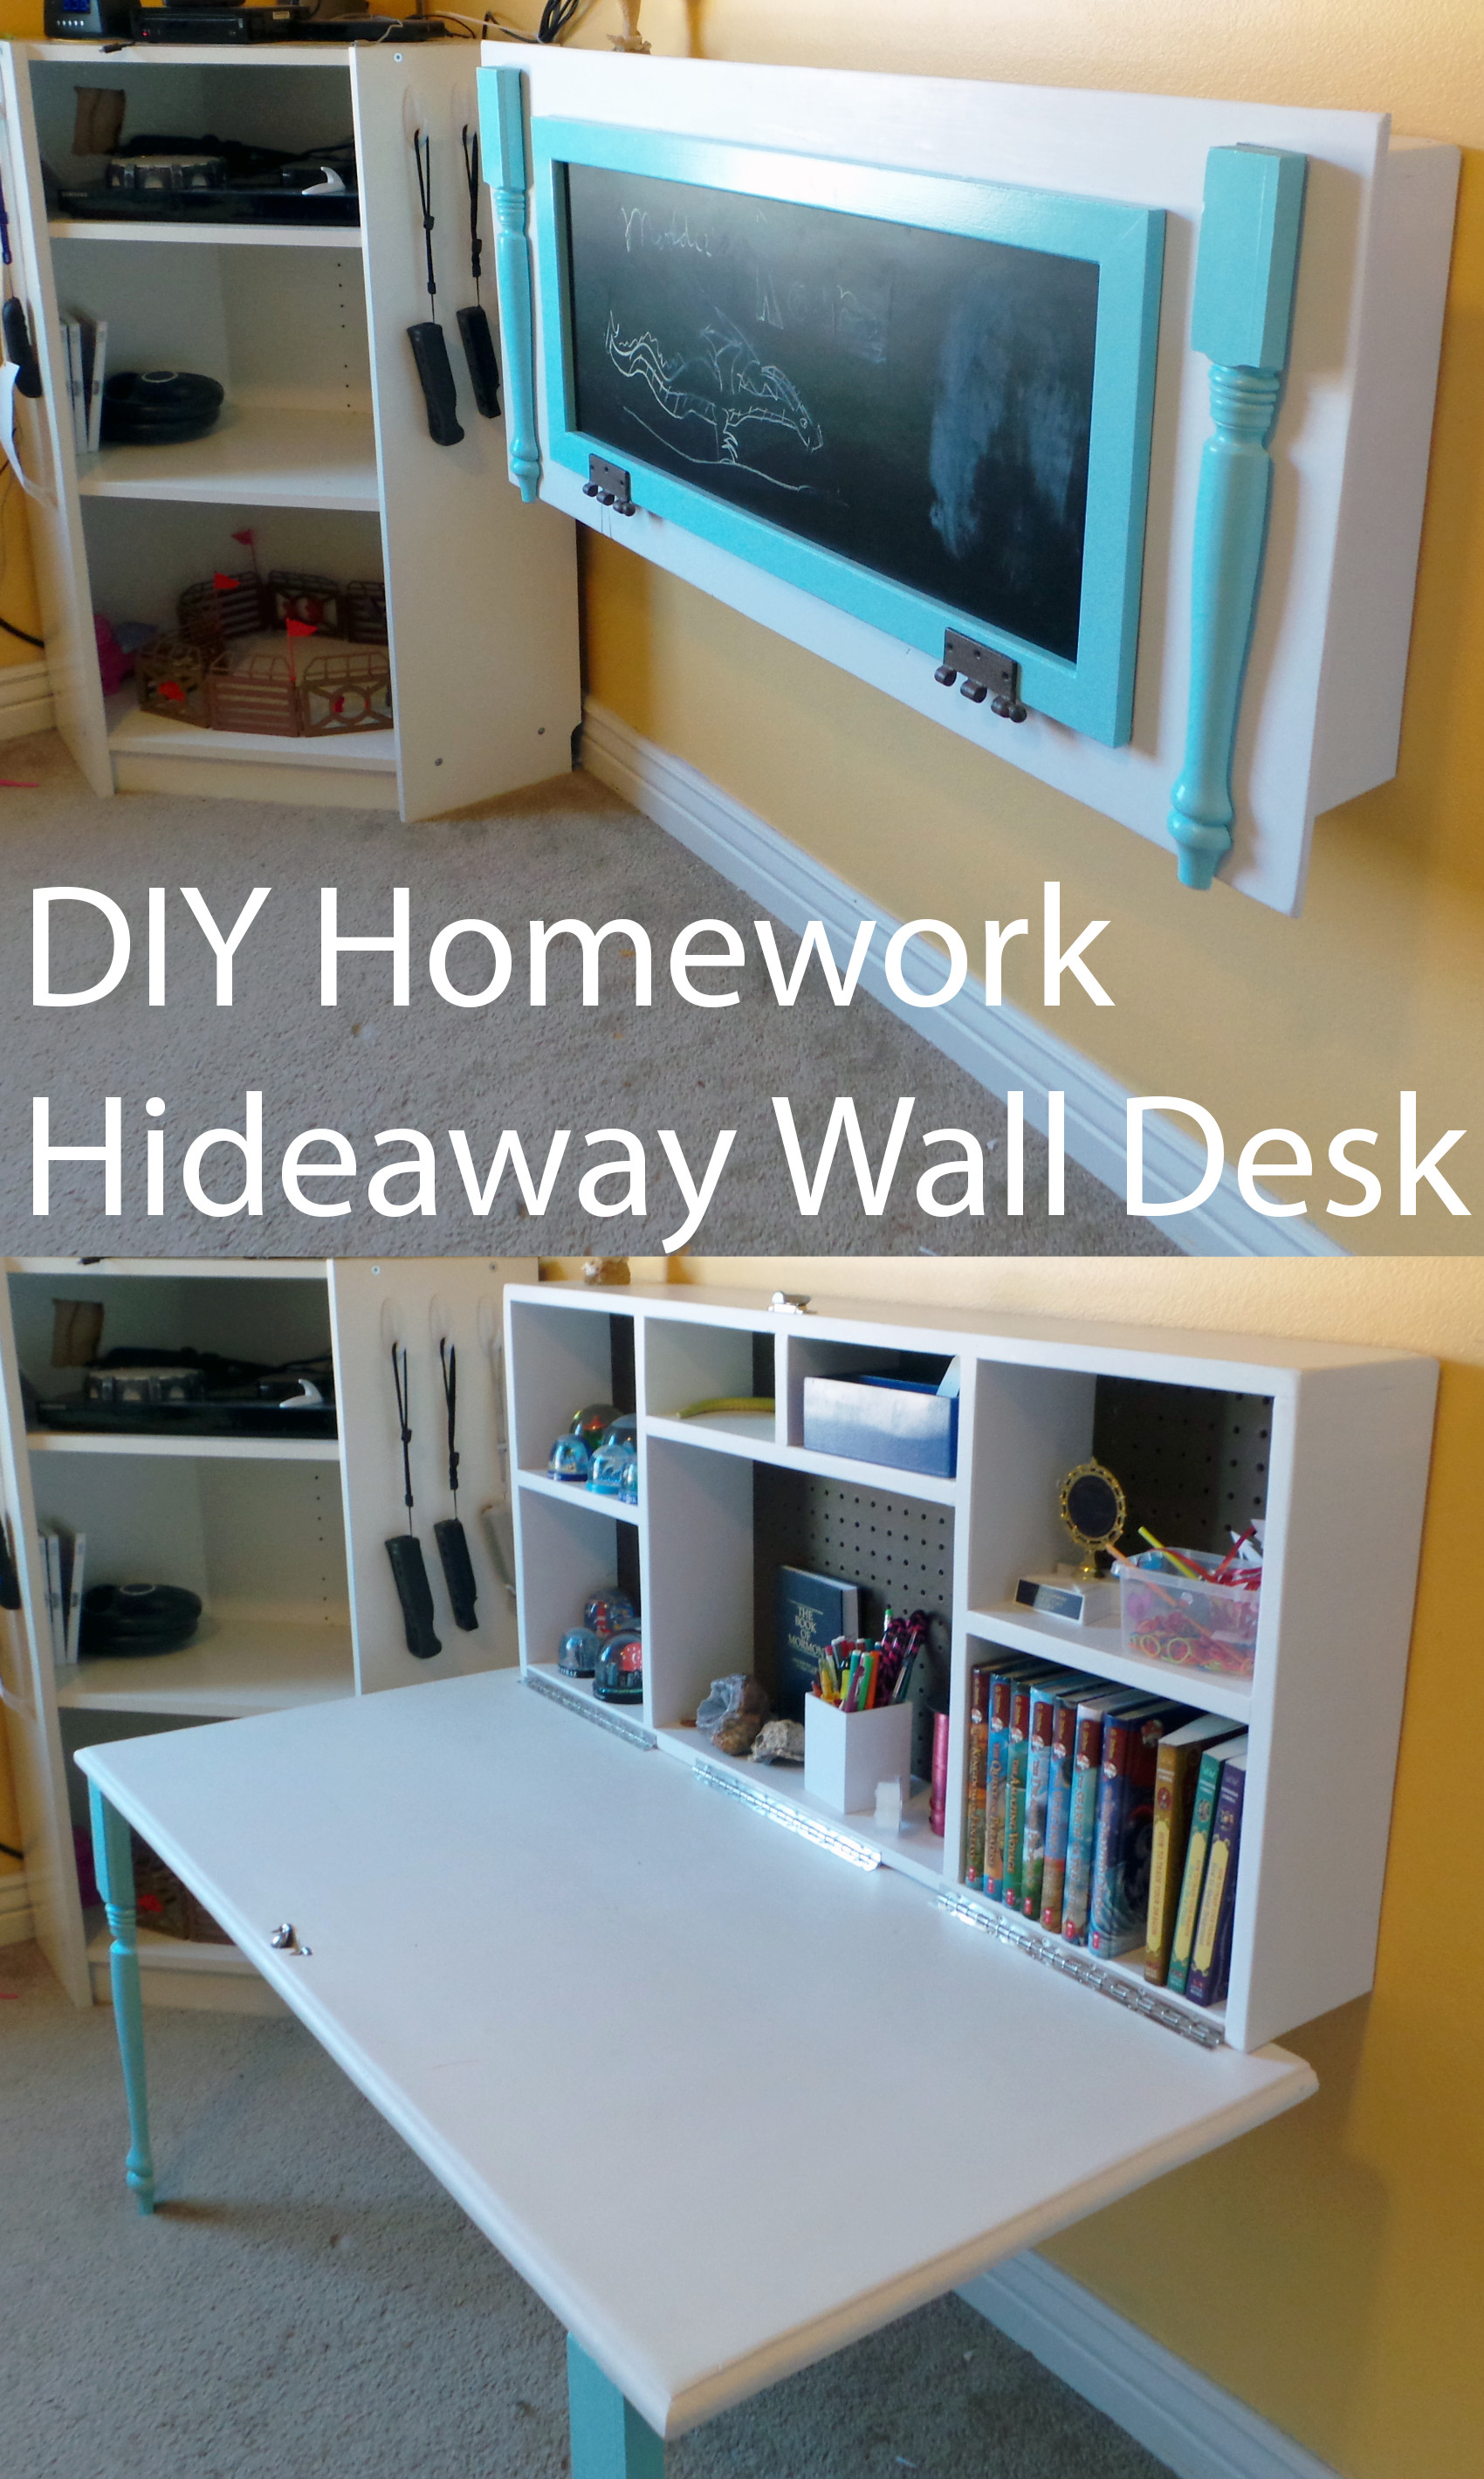 … Uncategorized 47 Incredible Diy Desk Diyomeworkideaway Wall Desk  Uncategorized Kids The Organized Mom Incredible Desktop Wallpaper